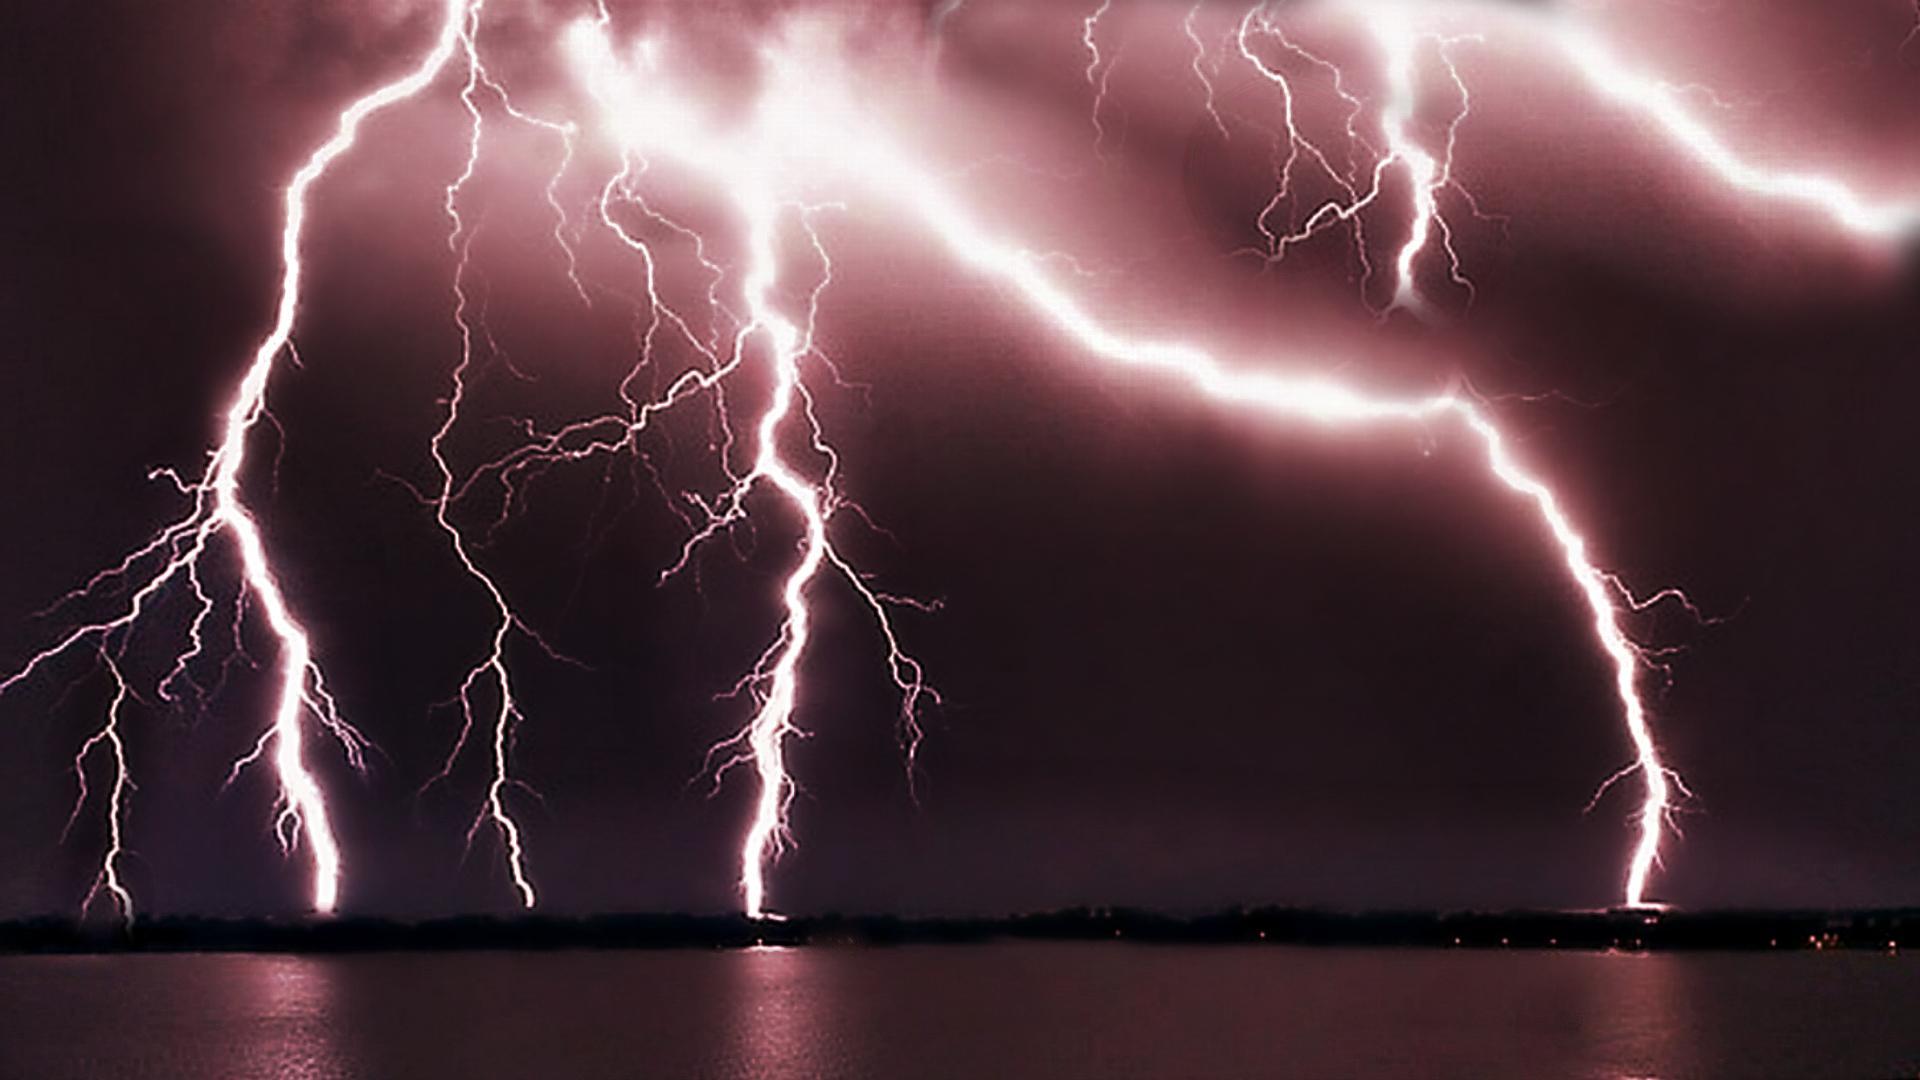 lightning storm wallpapers hd wallpapersafari